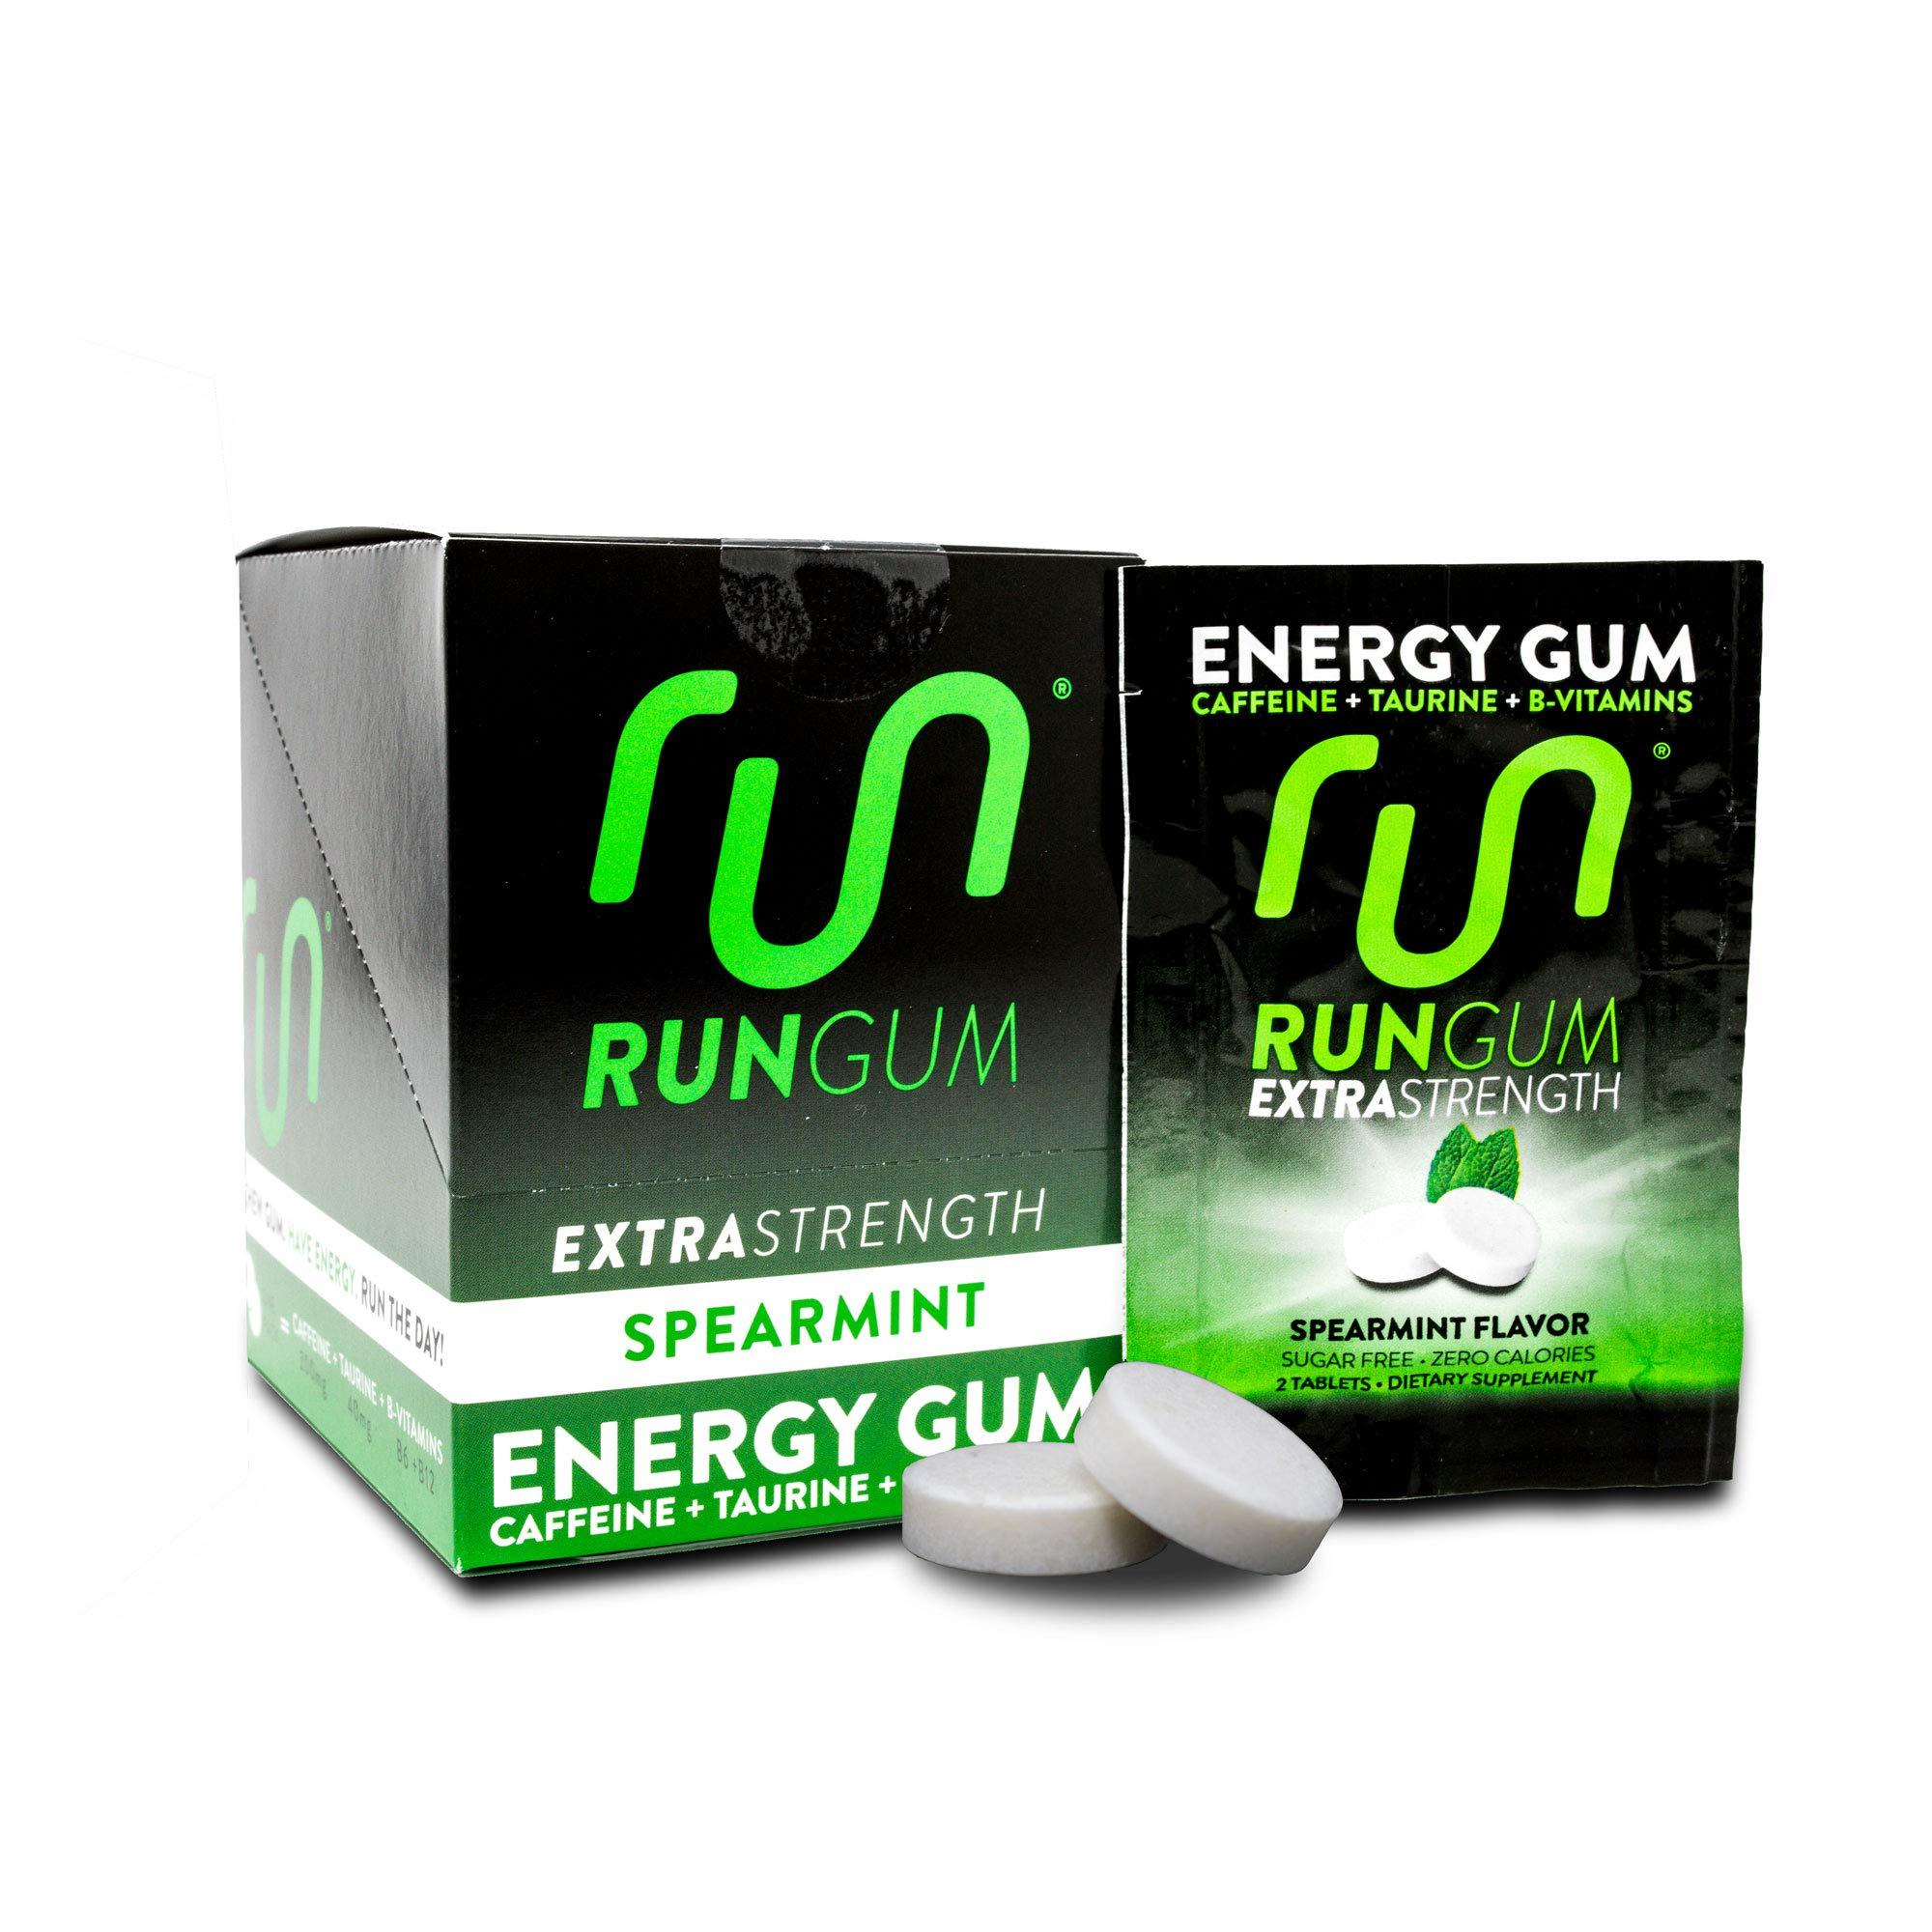 Extra Strength Spearmint Caffeinated Energy Gum 100mg Caffeine Taurine B-Vitamins (Box of 12 Packets, 24 Pieces) Zero Calorie Sugar Free No Aspartame Chewing Gum Tablet